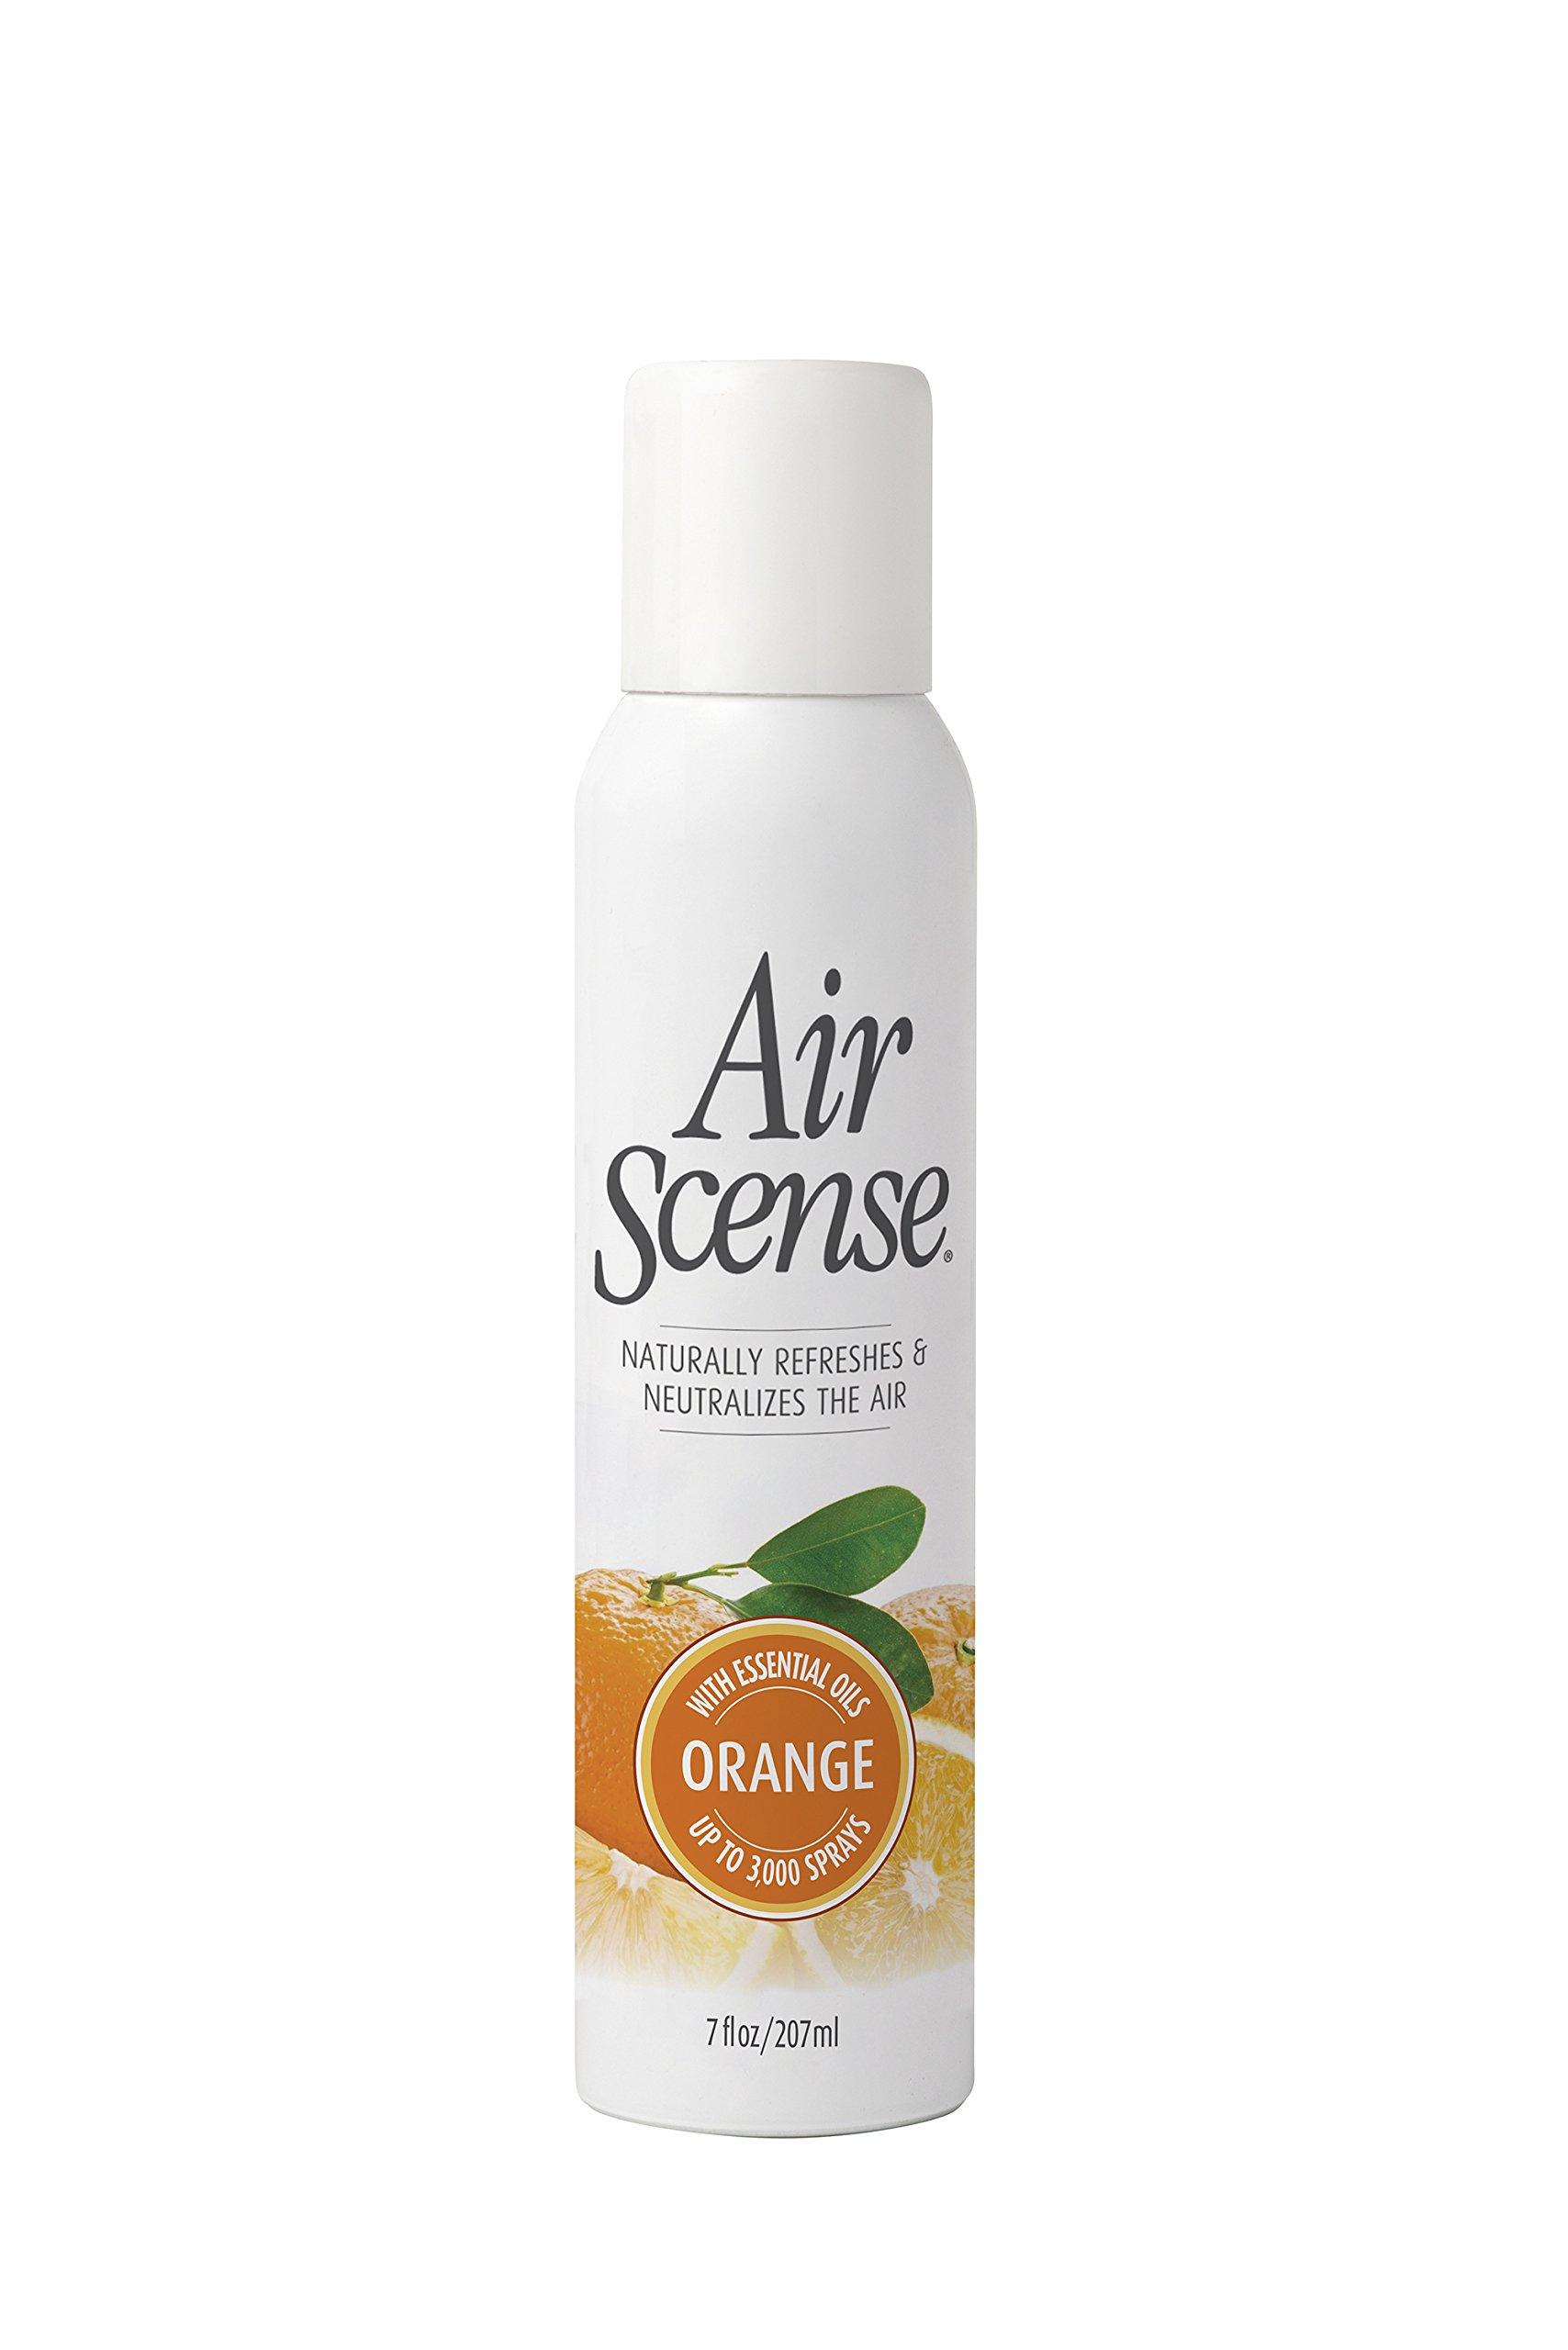 Air Scense Air Freshener, Orange - 7 Oz, 4 pack